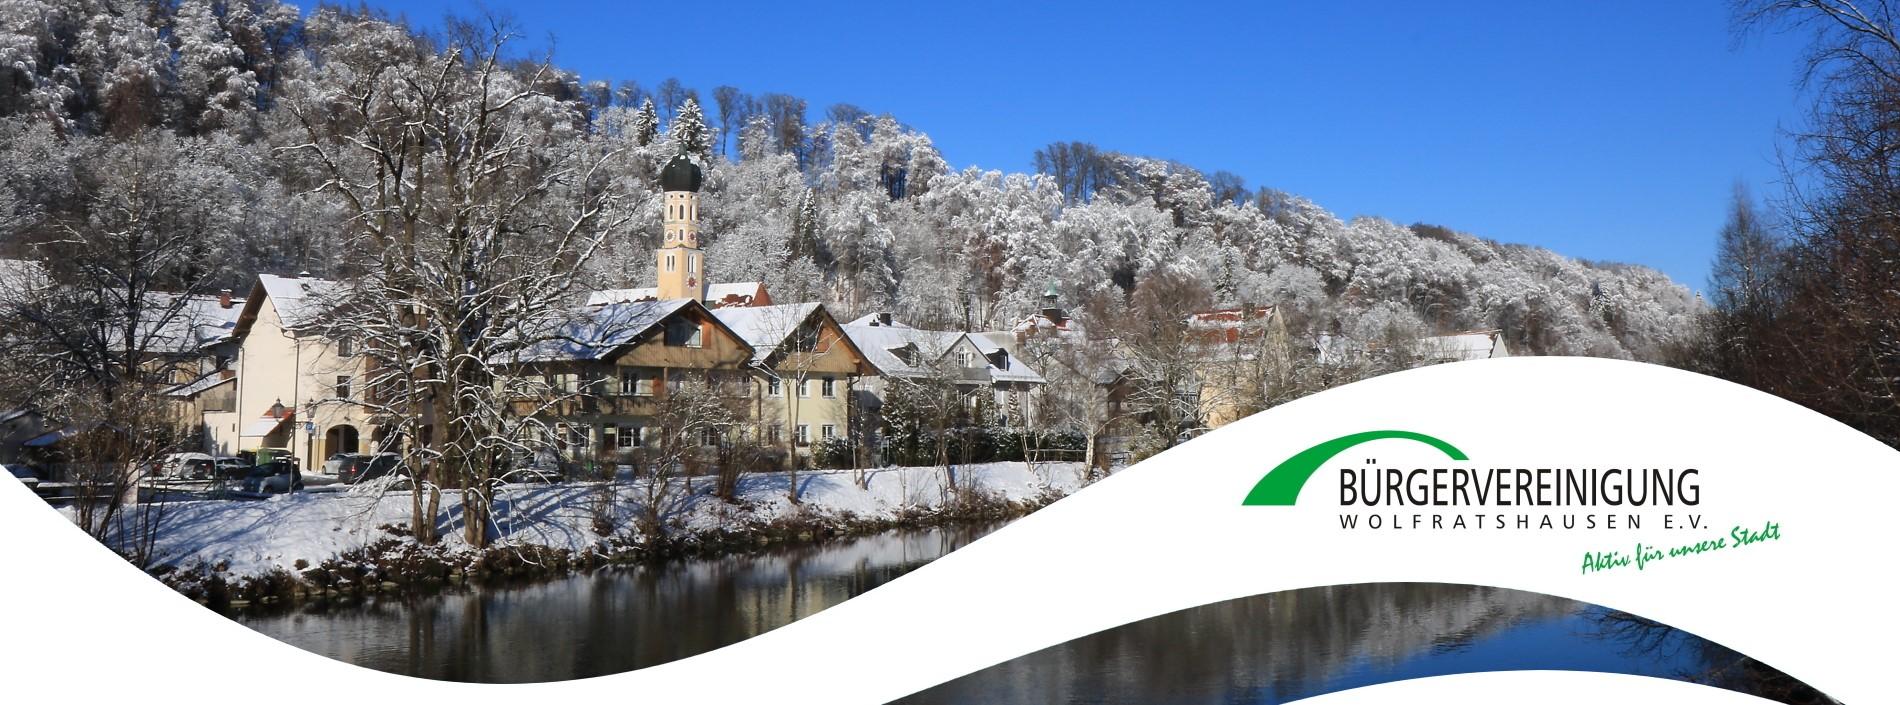 Bürgervereinigung Wolfratshausen e.V.